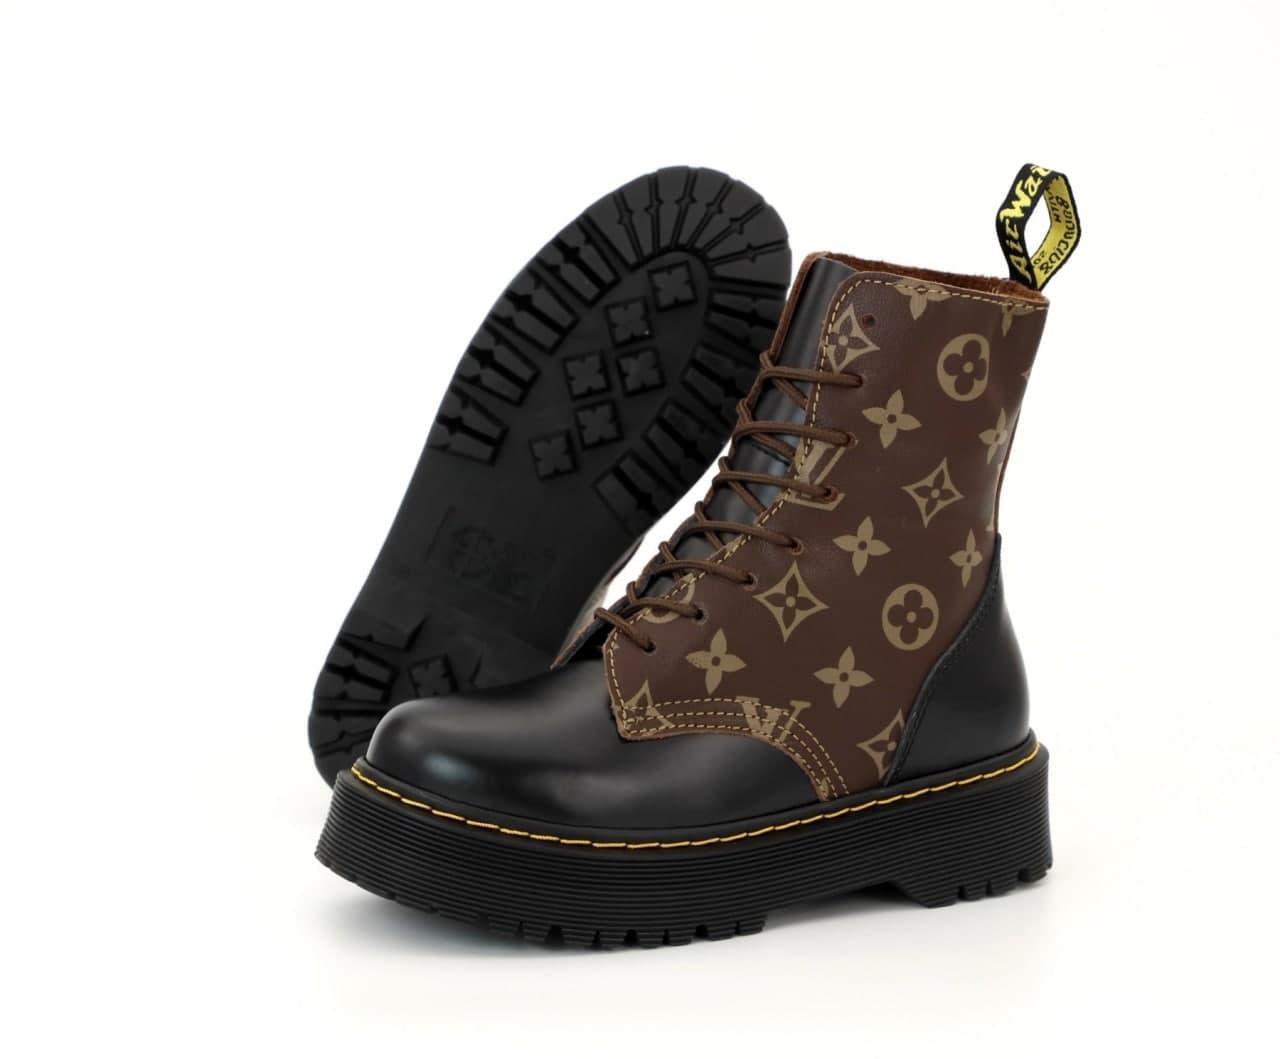 Женские ботинки Dr. Martens & Louis Vuitton 31860 коричневые